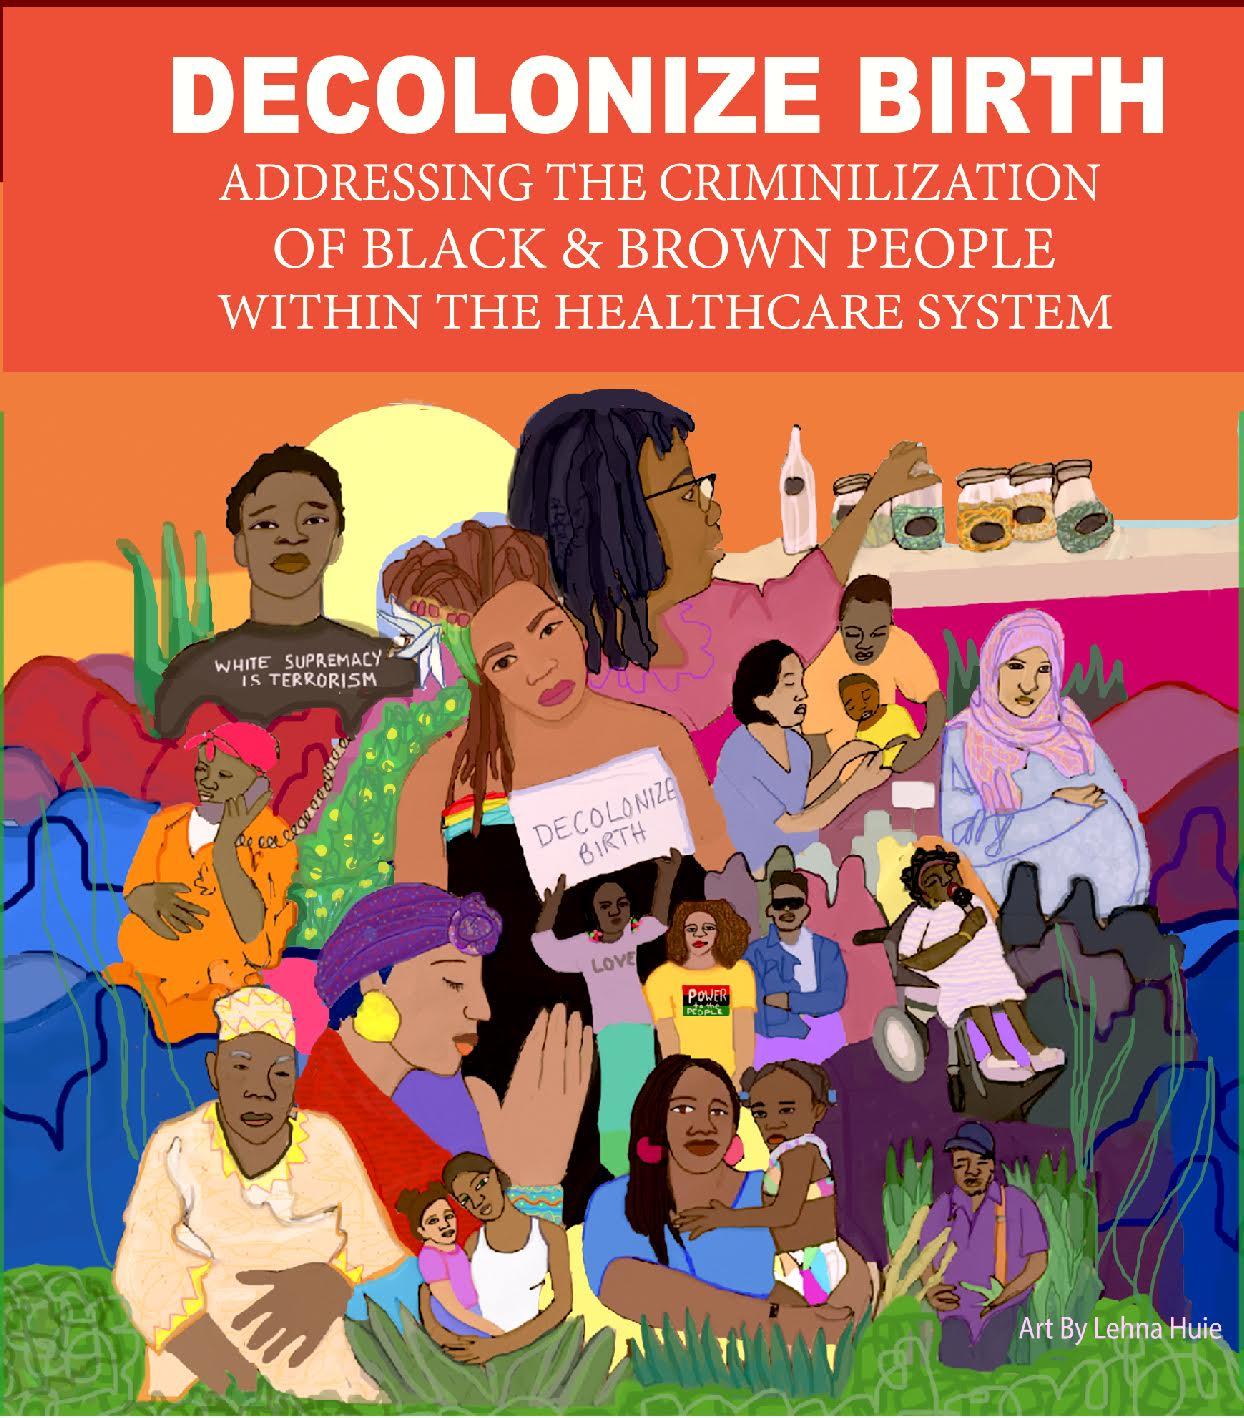 Decolonize Birth 2018